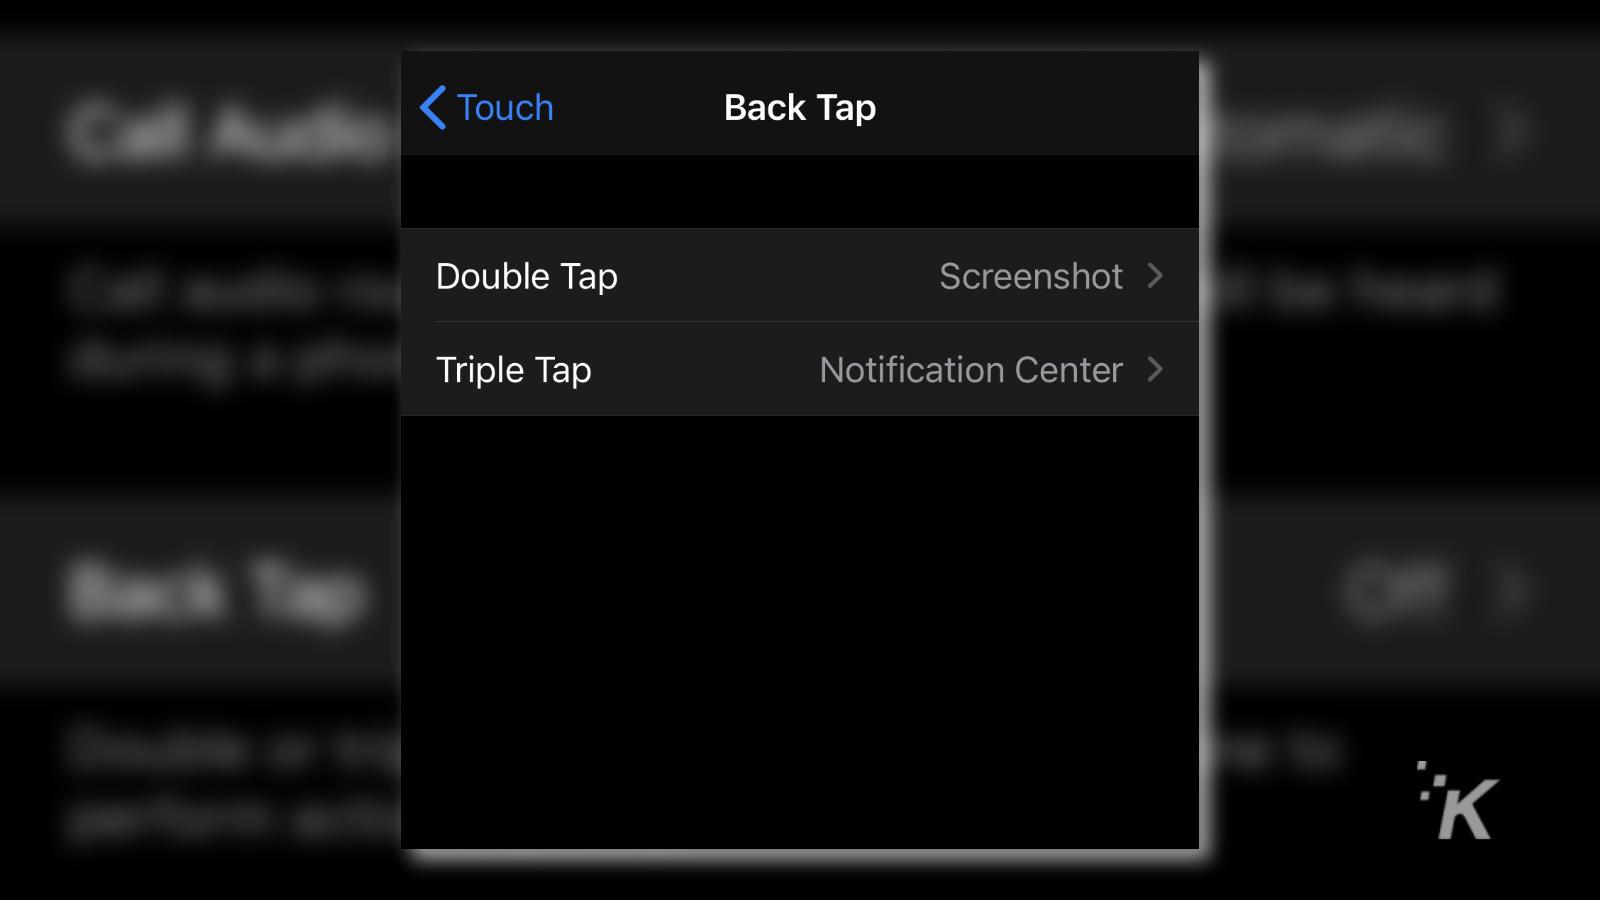 ios 14 back tap settings